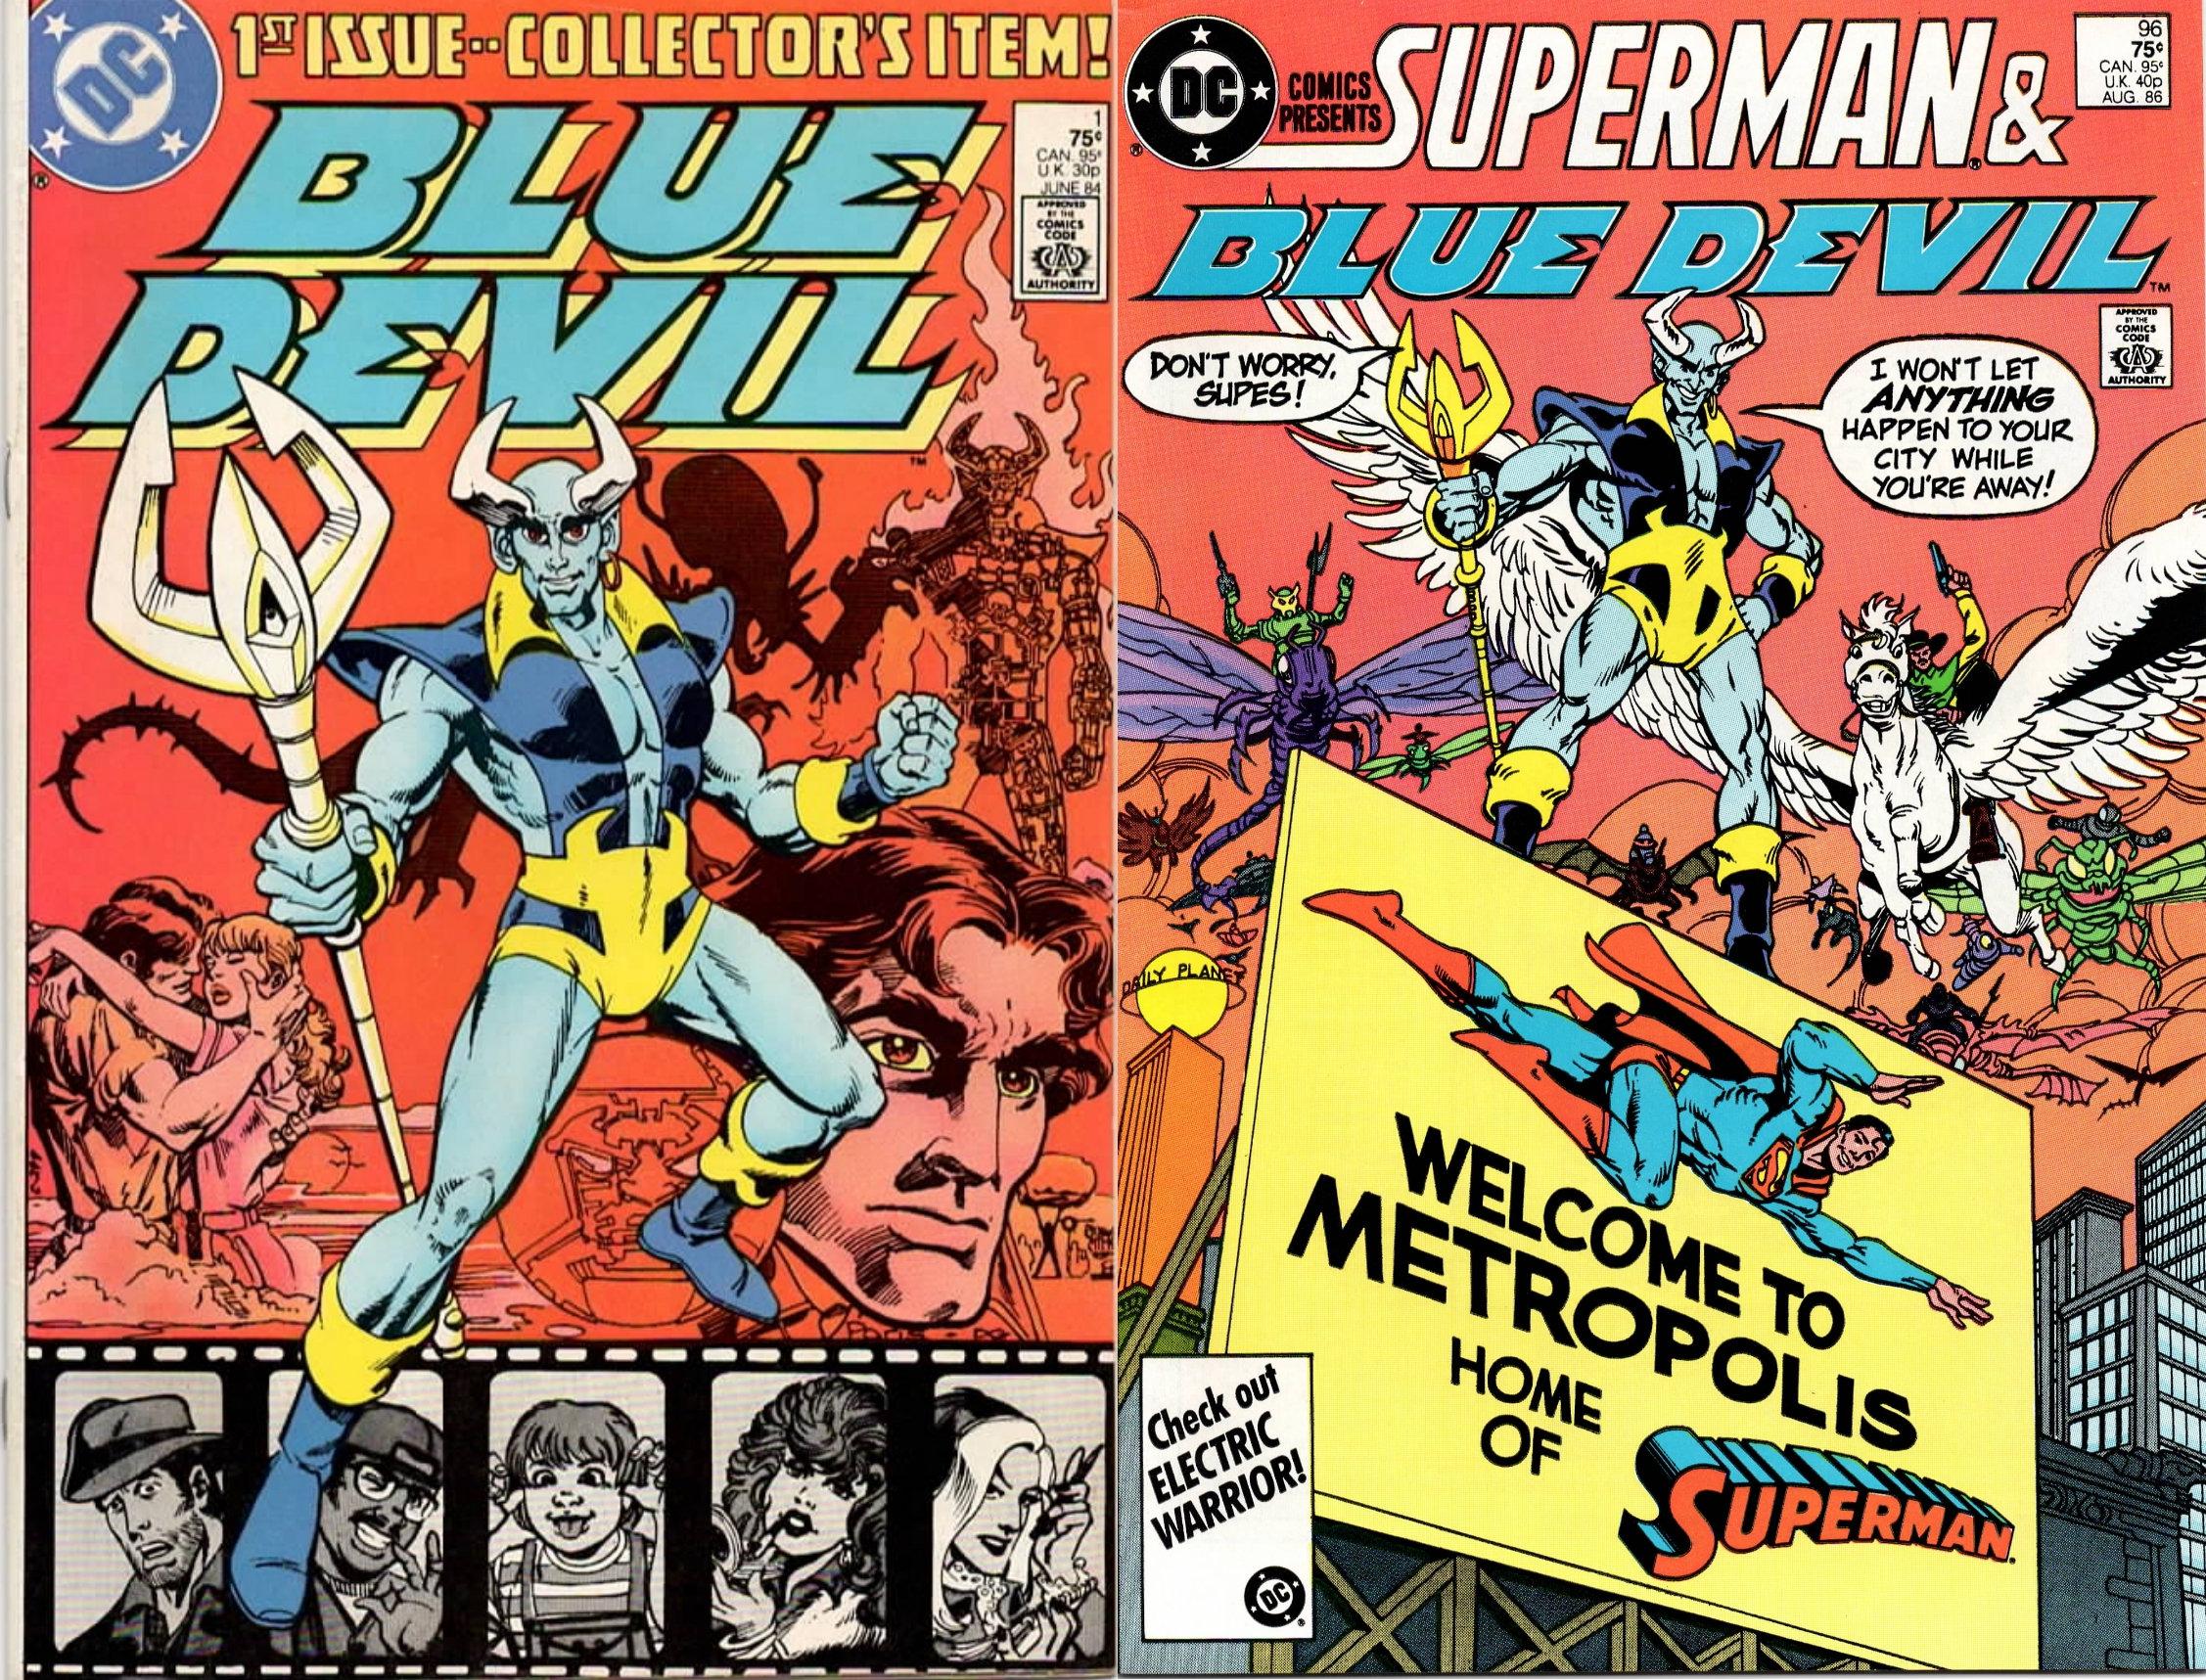 9.4 Or Better DC SUPERMAN ACTION COMICS #41 JOKER 75 YEARS VARIANT COVER